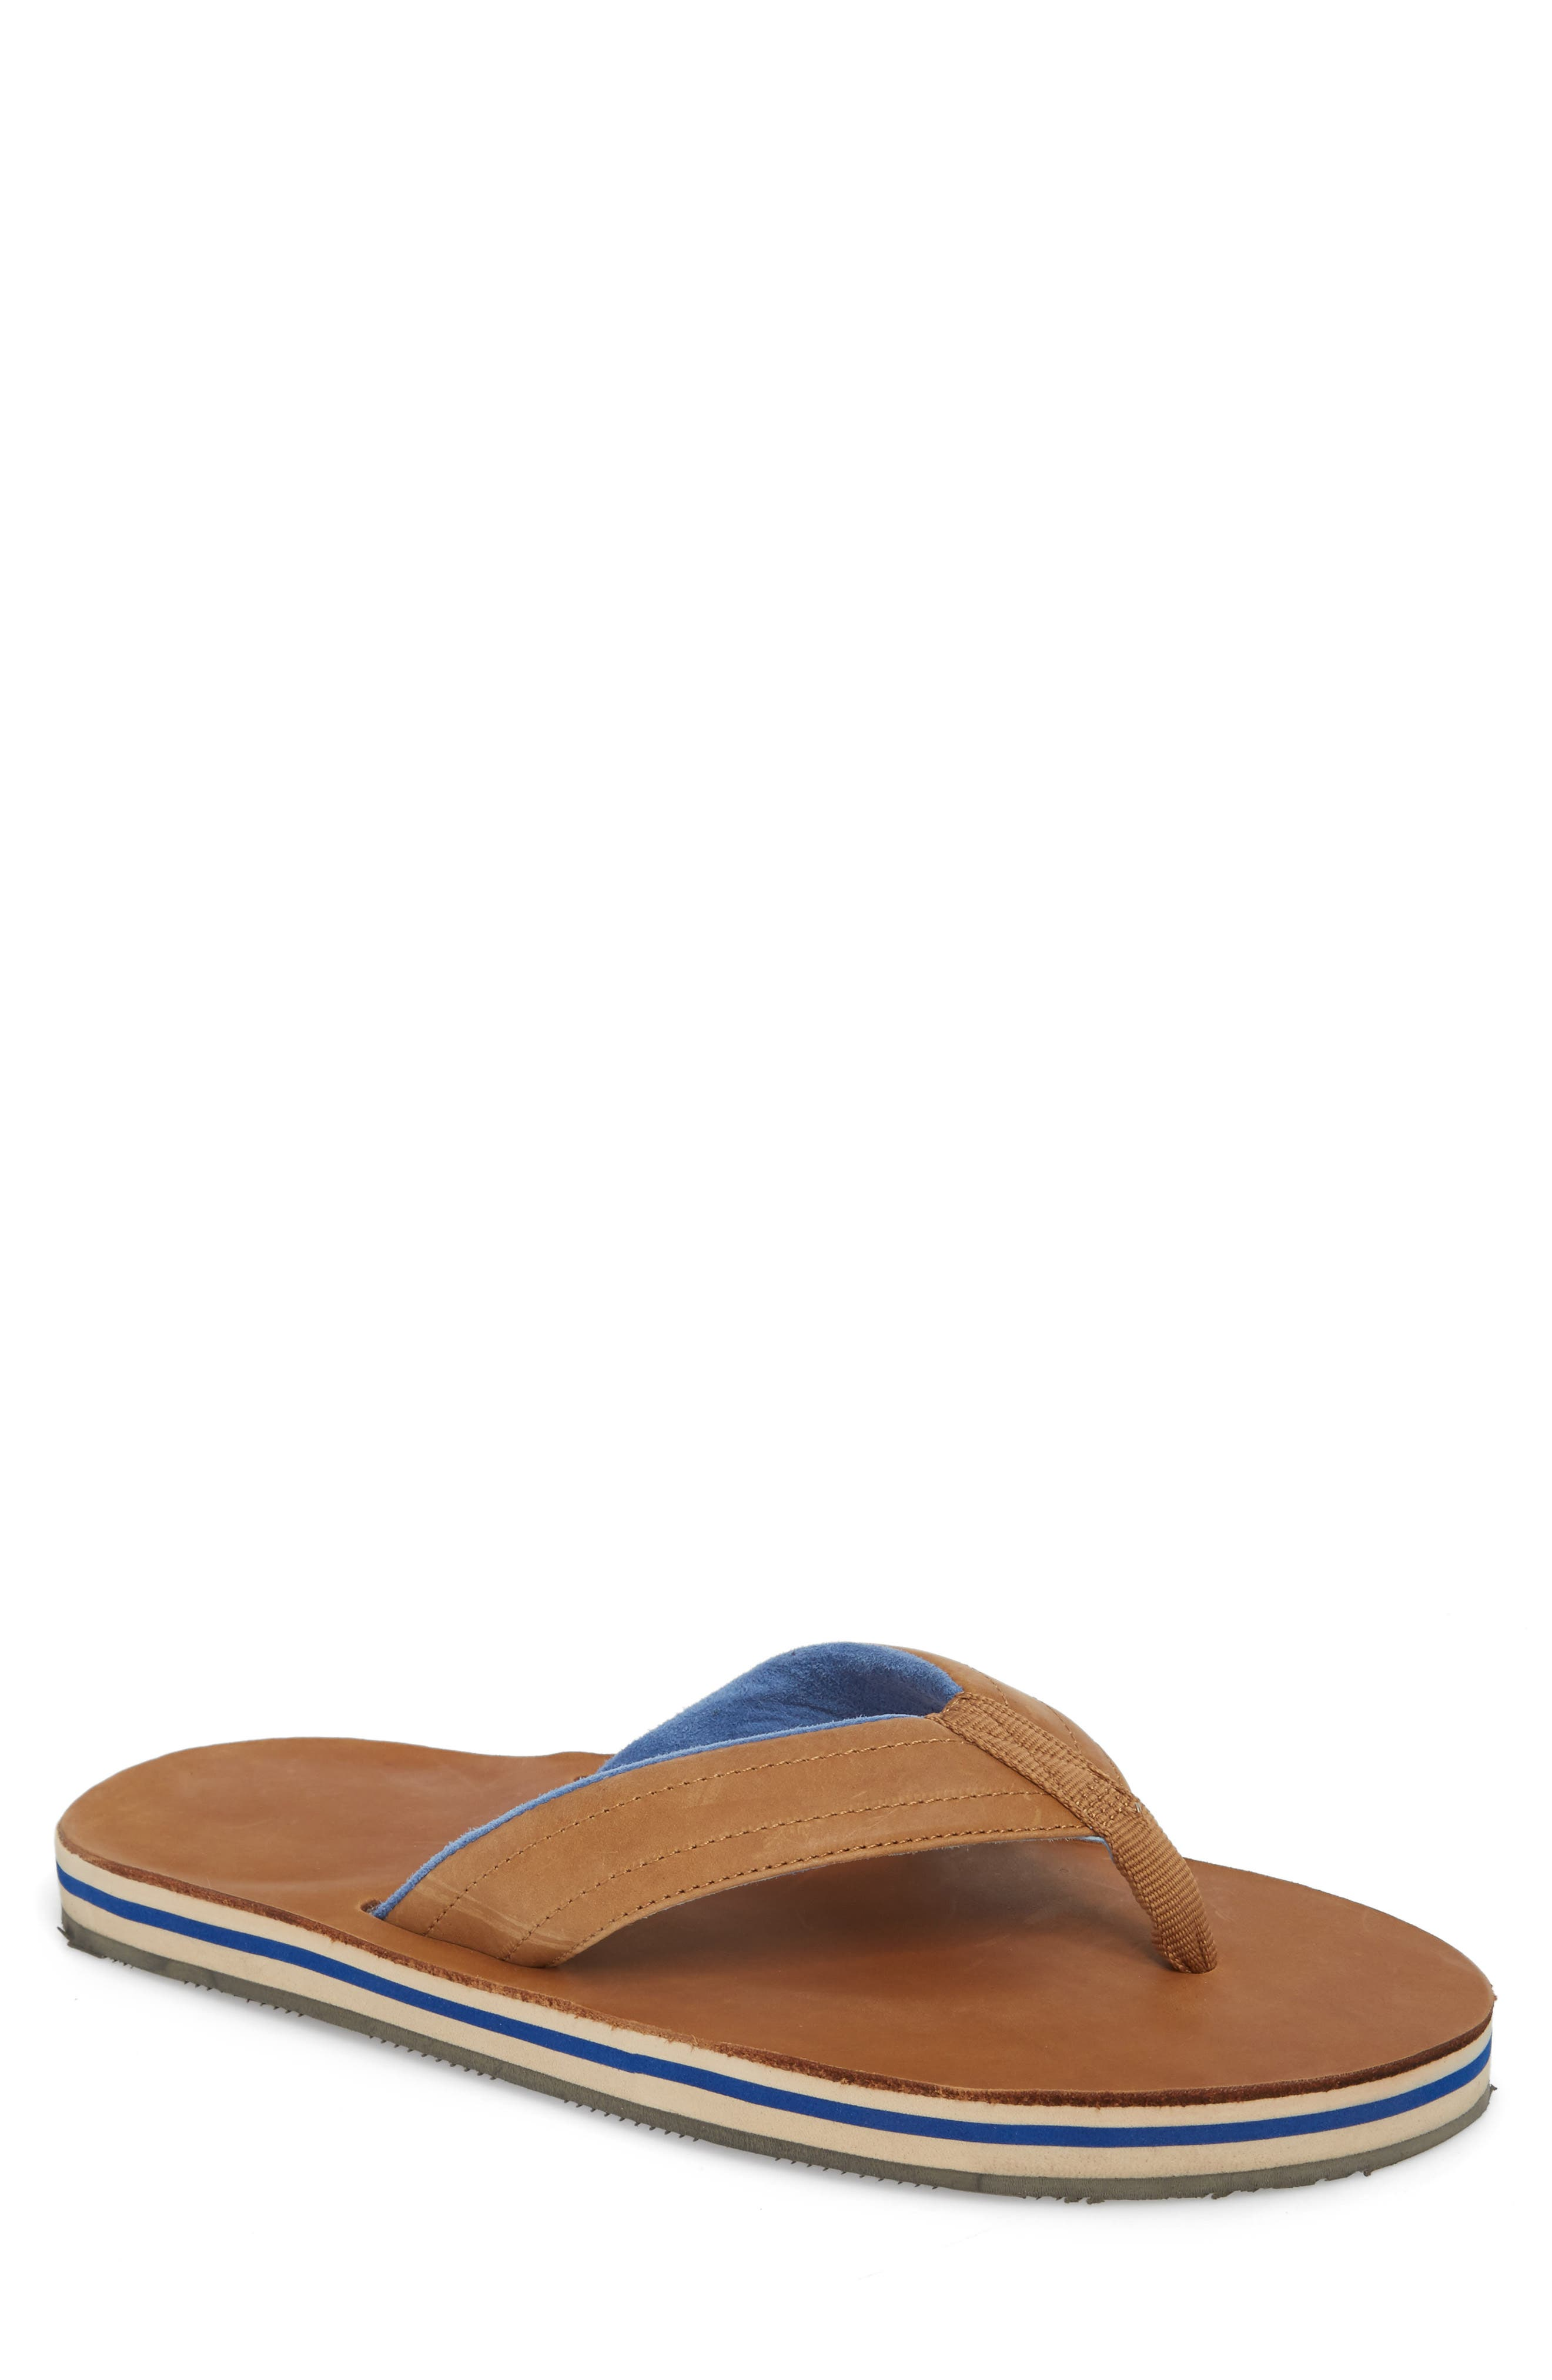 Lakes Sandwich Stripe Flip Flop,                             Main thumbnail 1, color,                             Tan/ Navy Leather